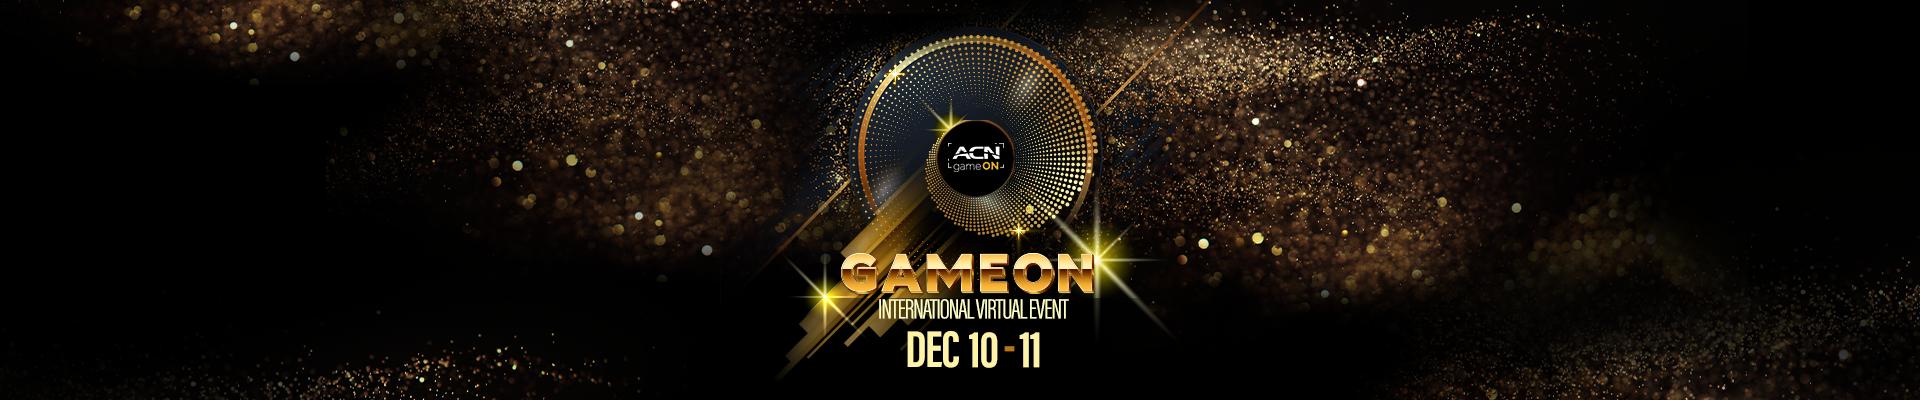 ACN-Compass-GameON-Dec-1920x400_